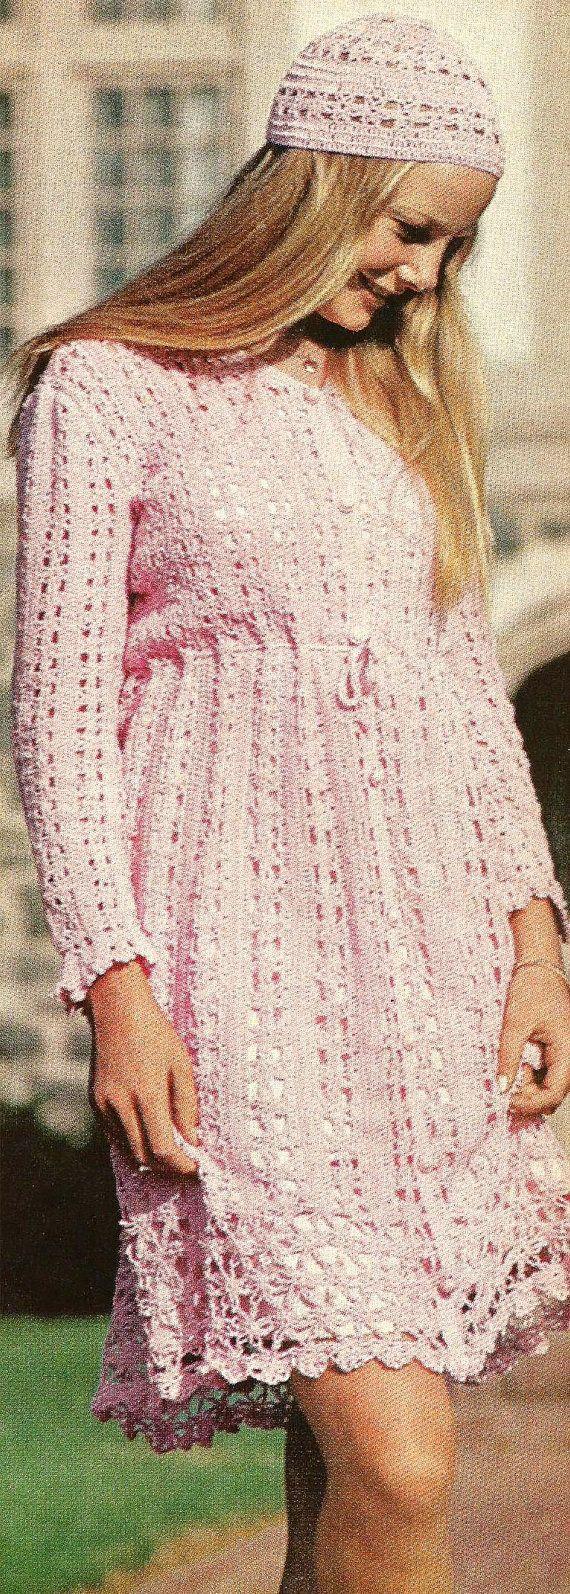 Instant PDF Digital Download Old Vintage Retro Crocheted Crocheting Crochet Pattern Instructions Flower Floral Lacy Patterned Dress Cap Hat